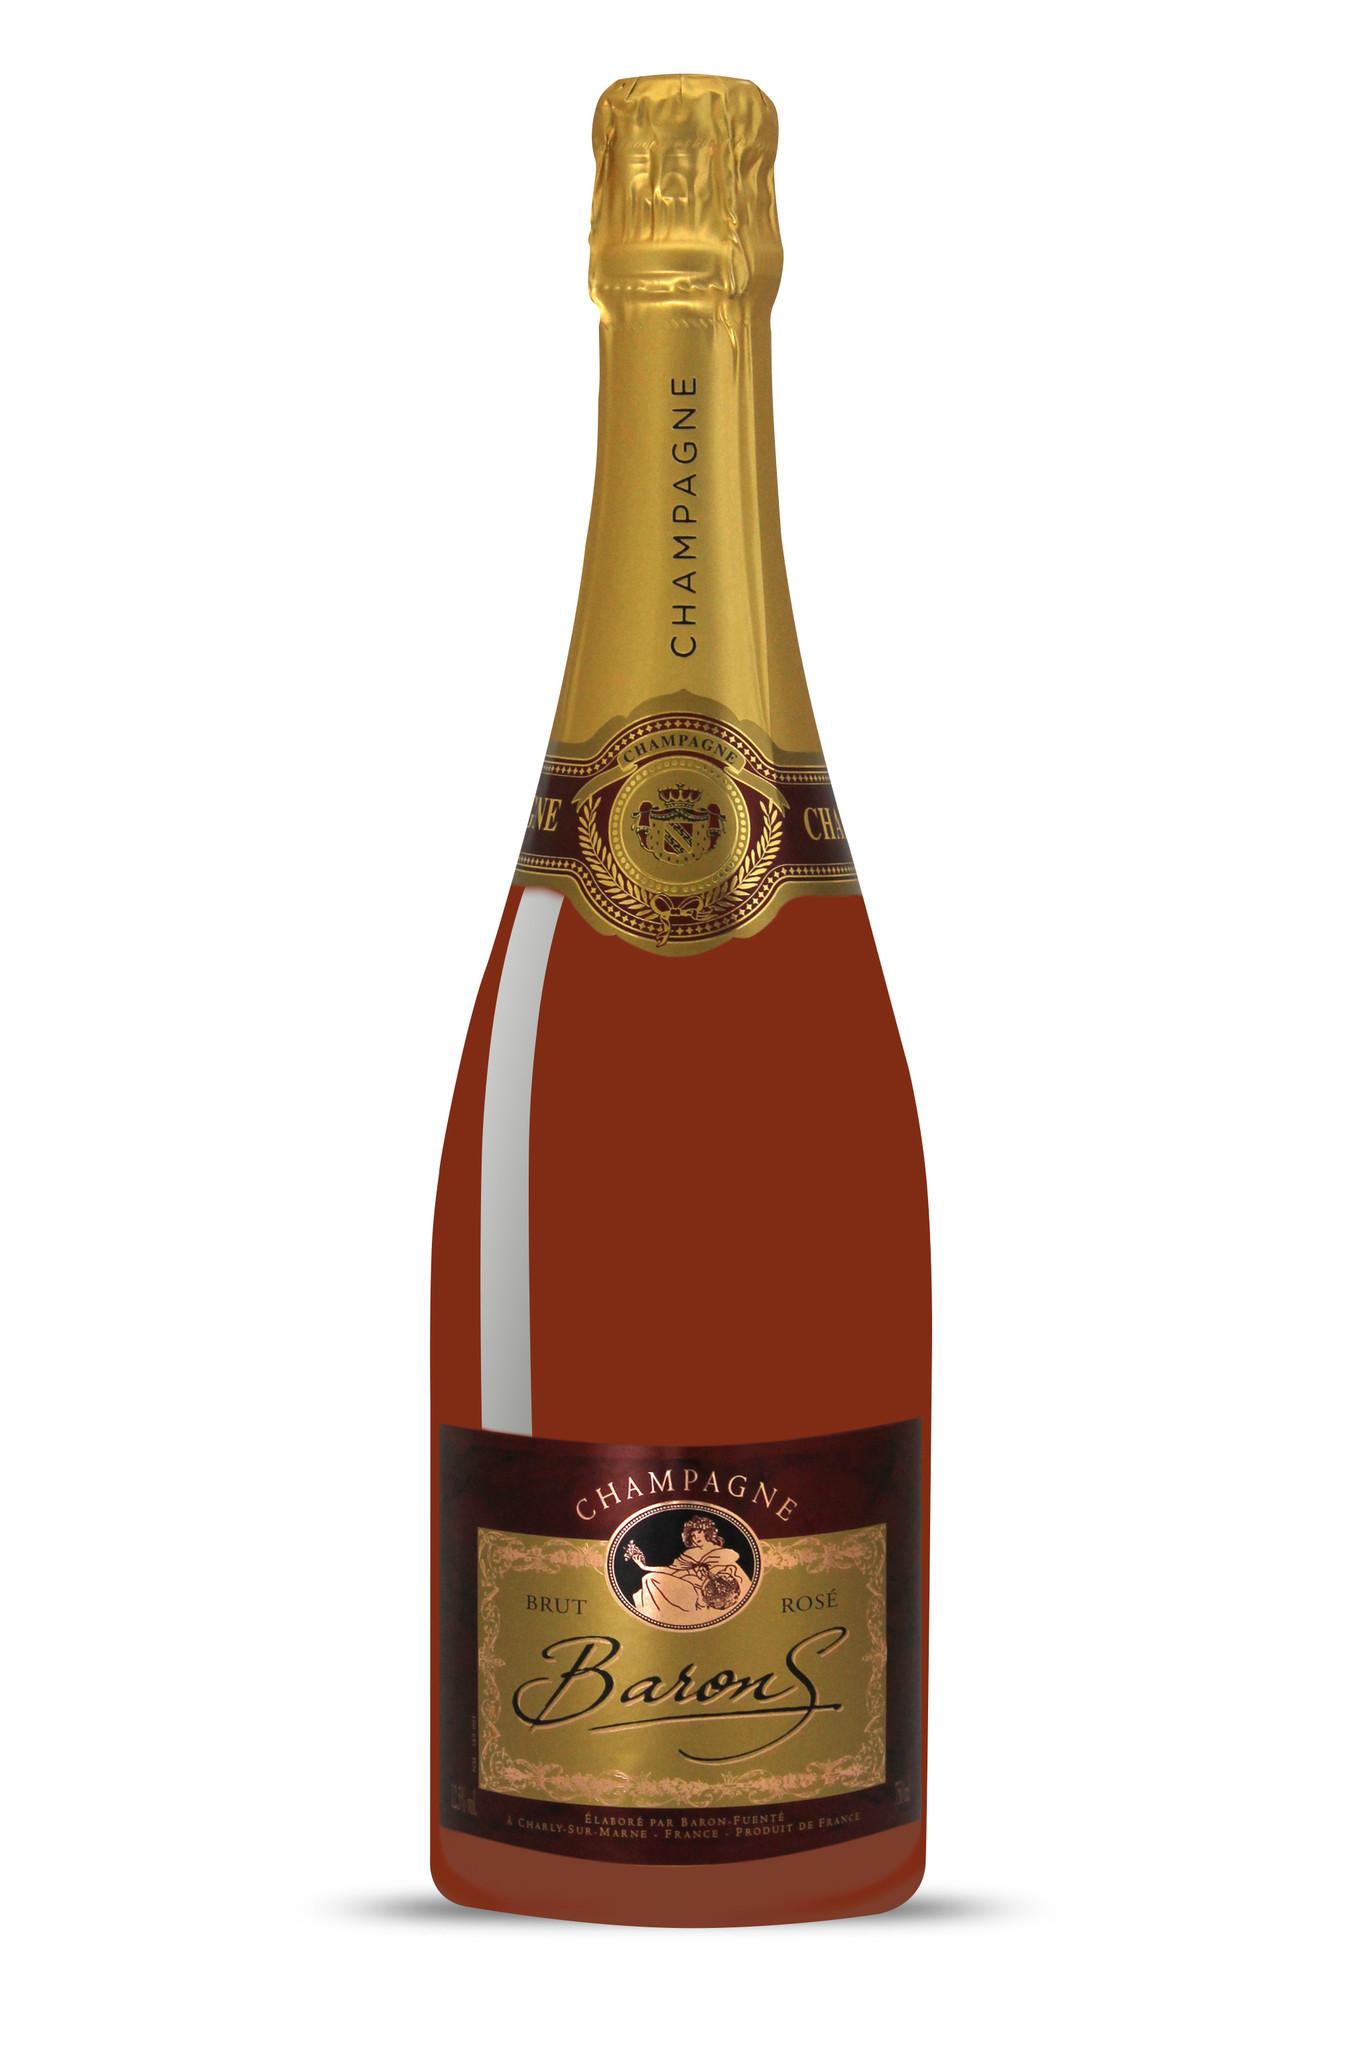 Champagne Baron's Brut Rosé-1